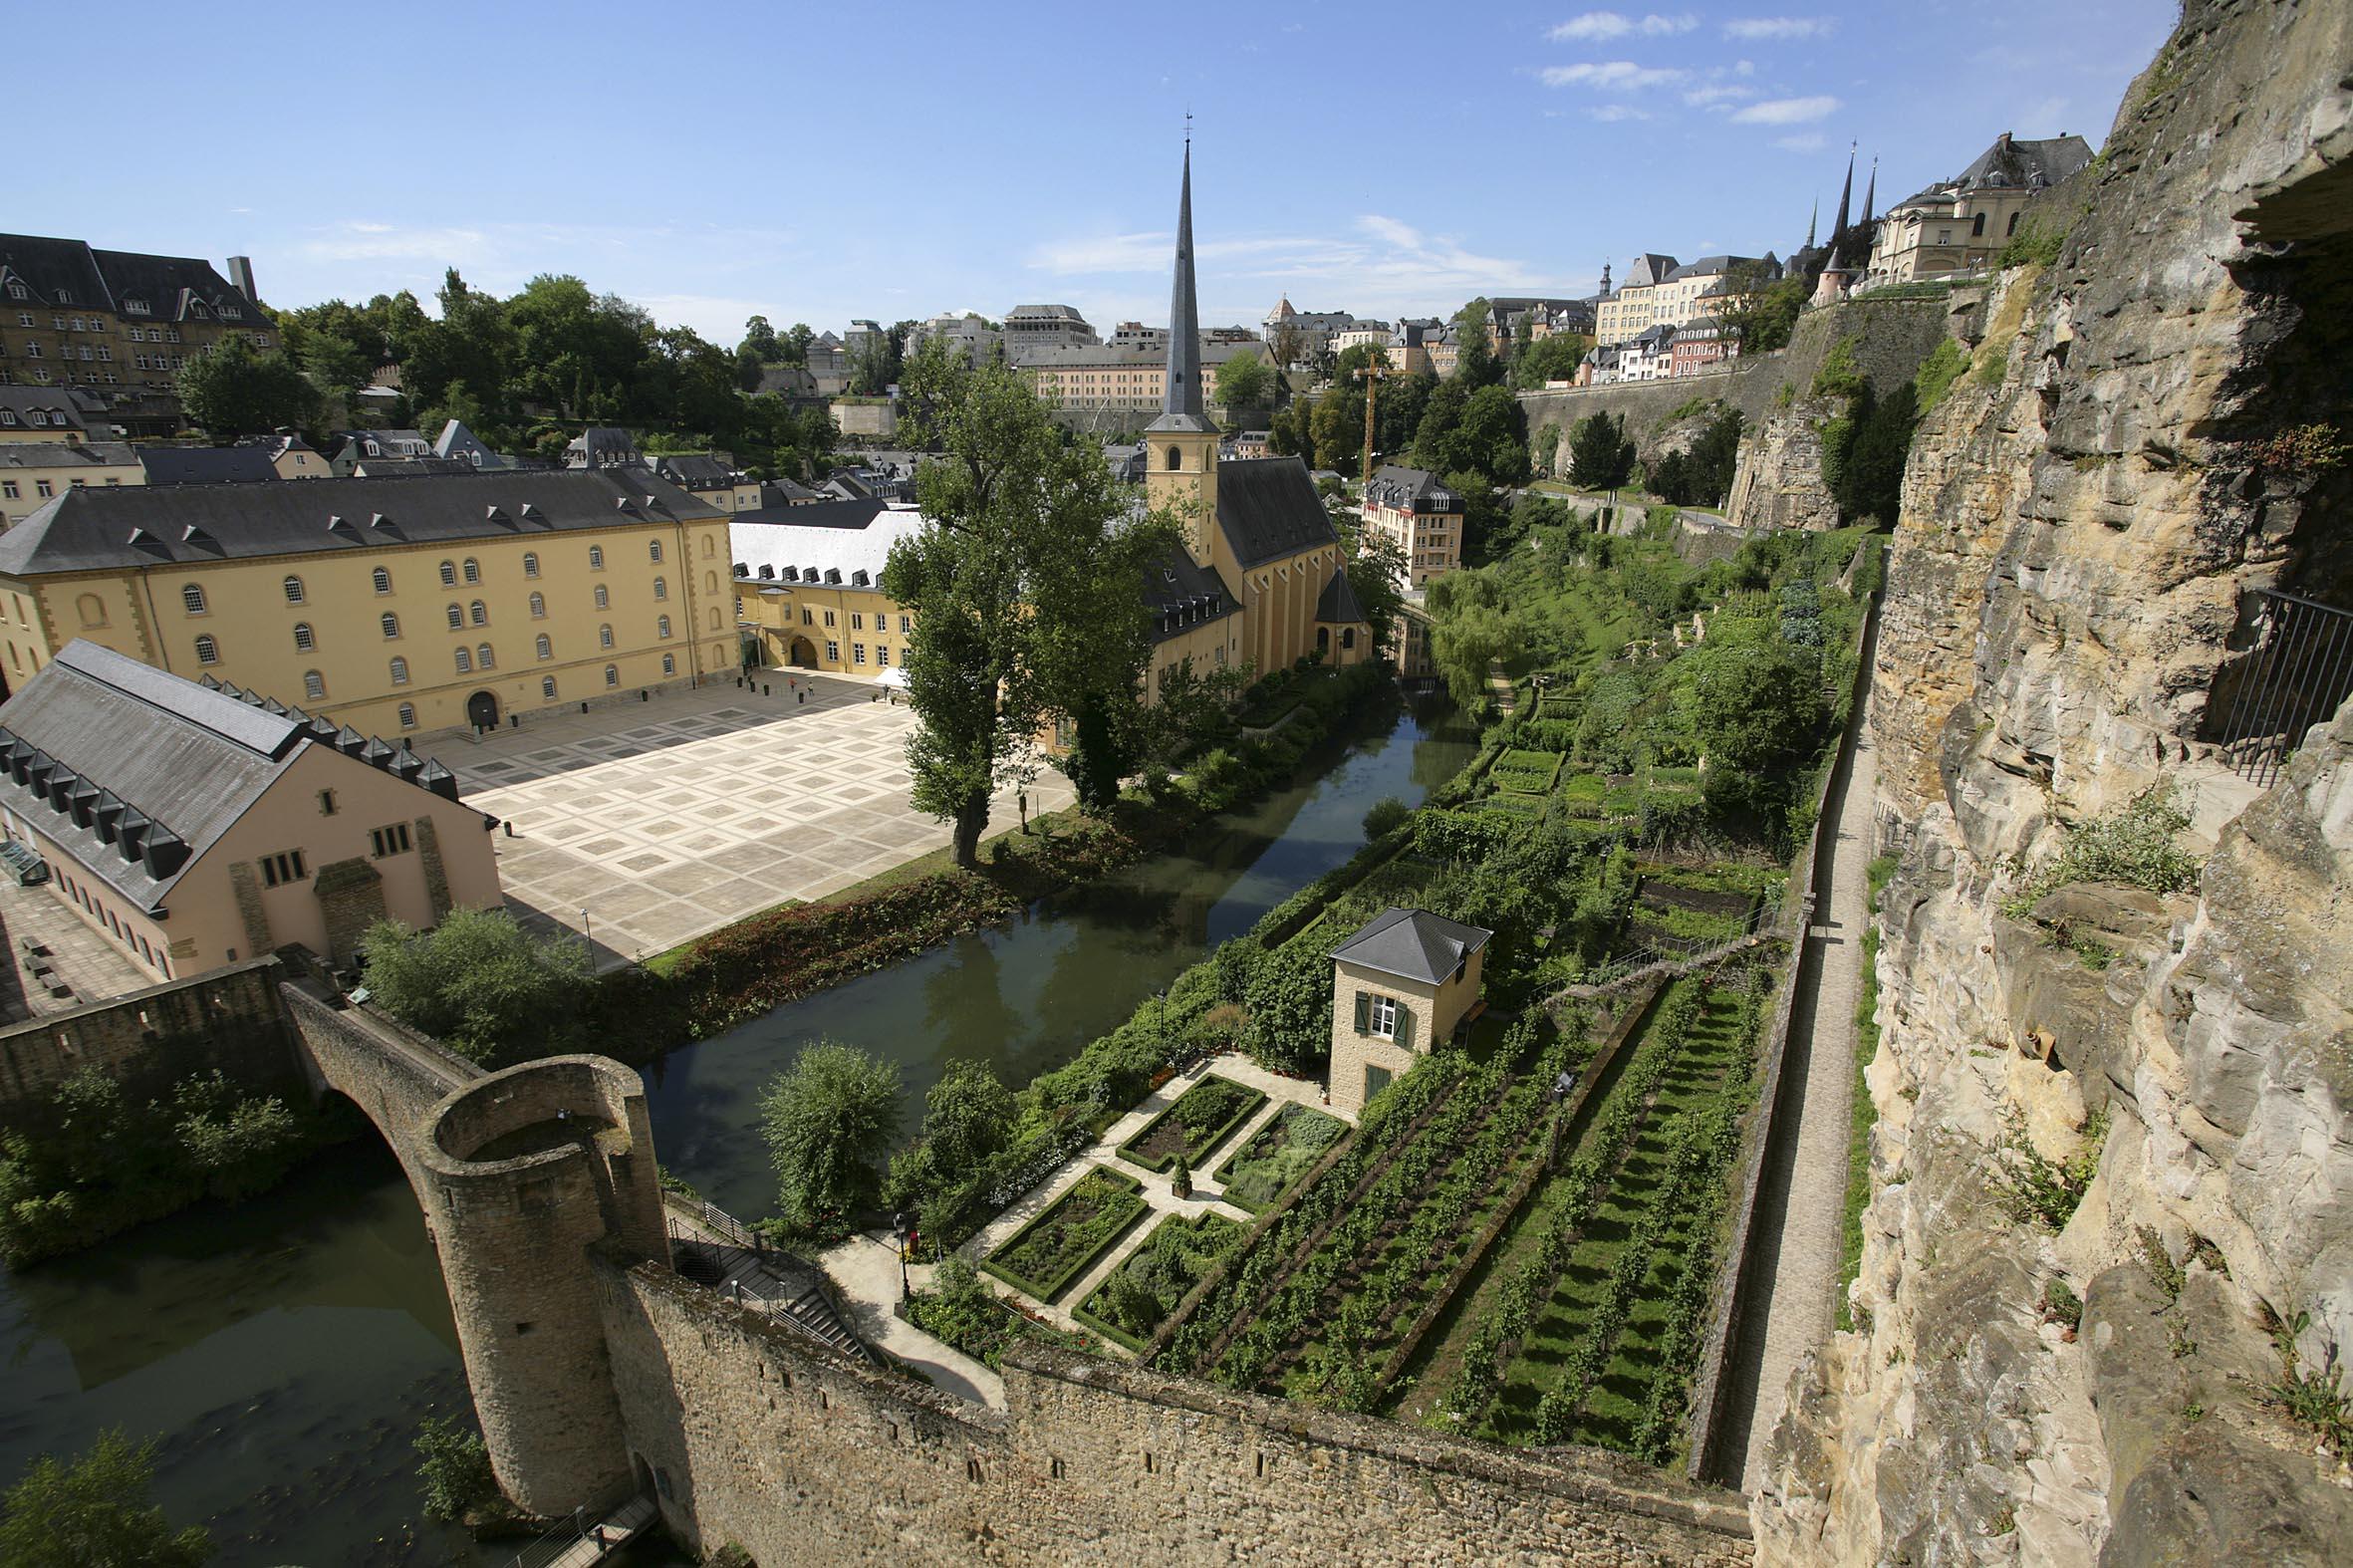 Site de rencontre Nice People - Rencontres au Luxembourg